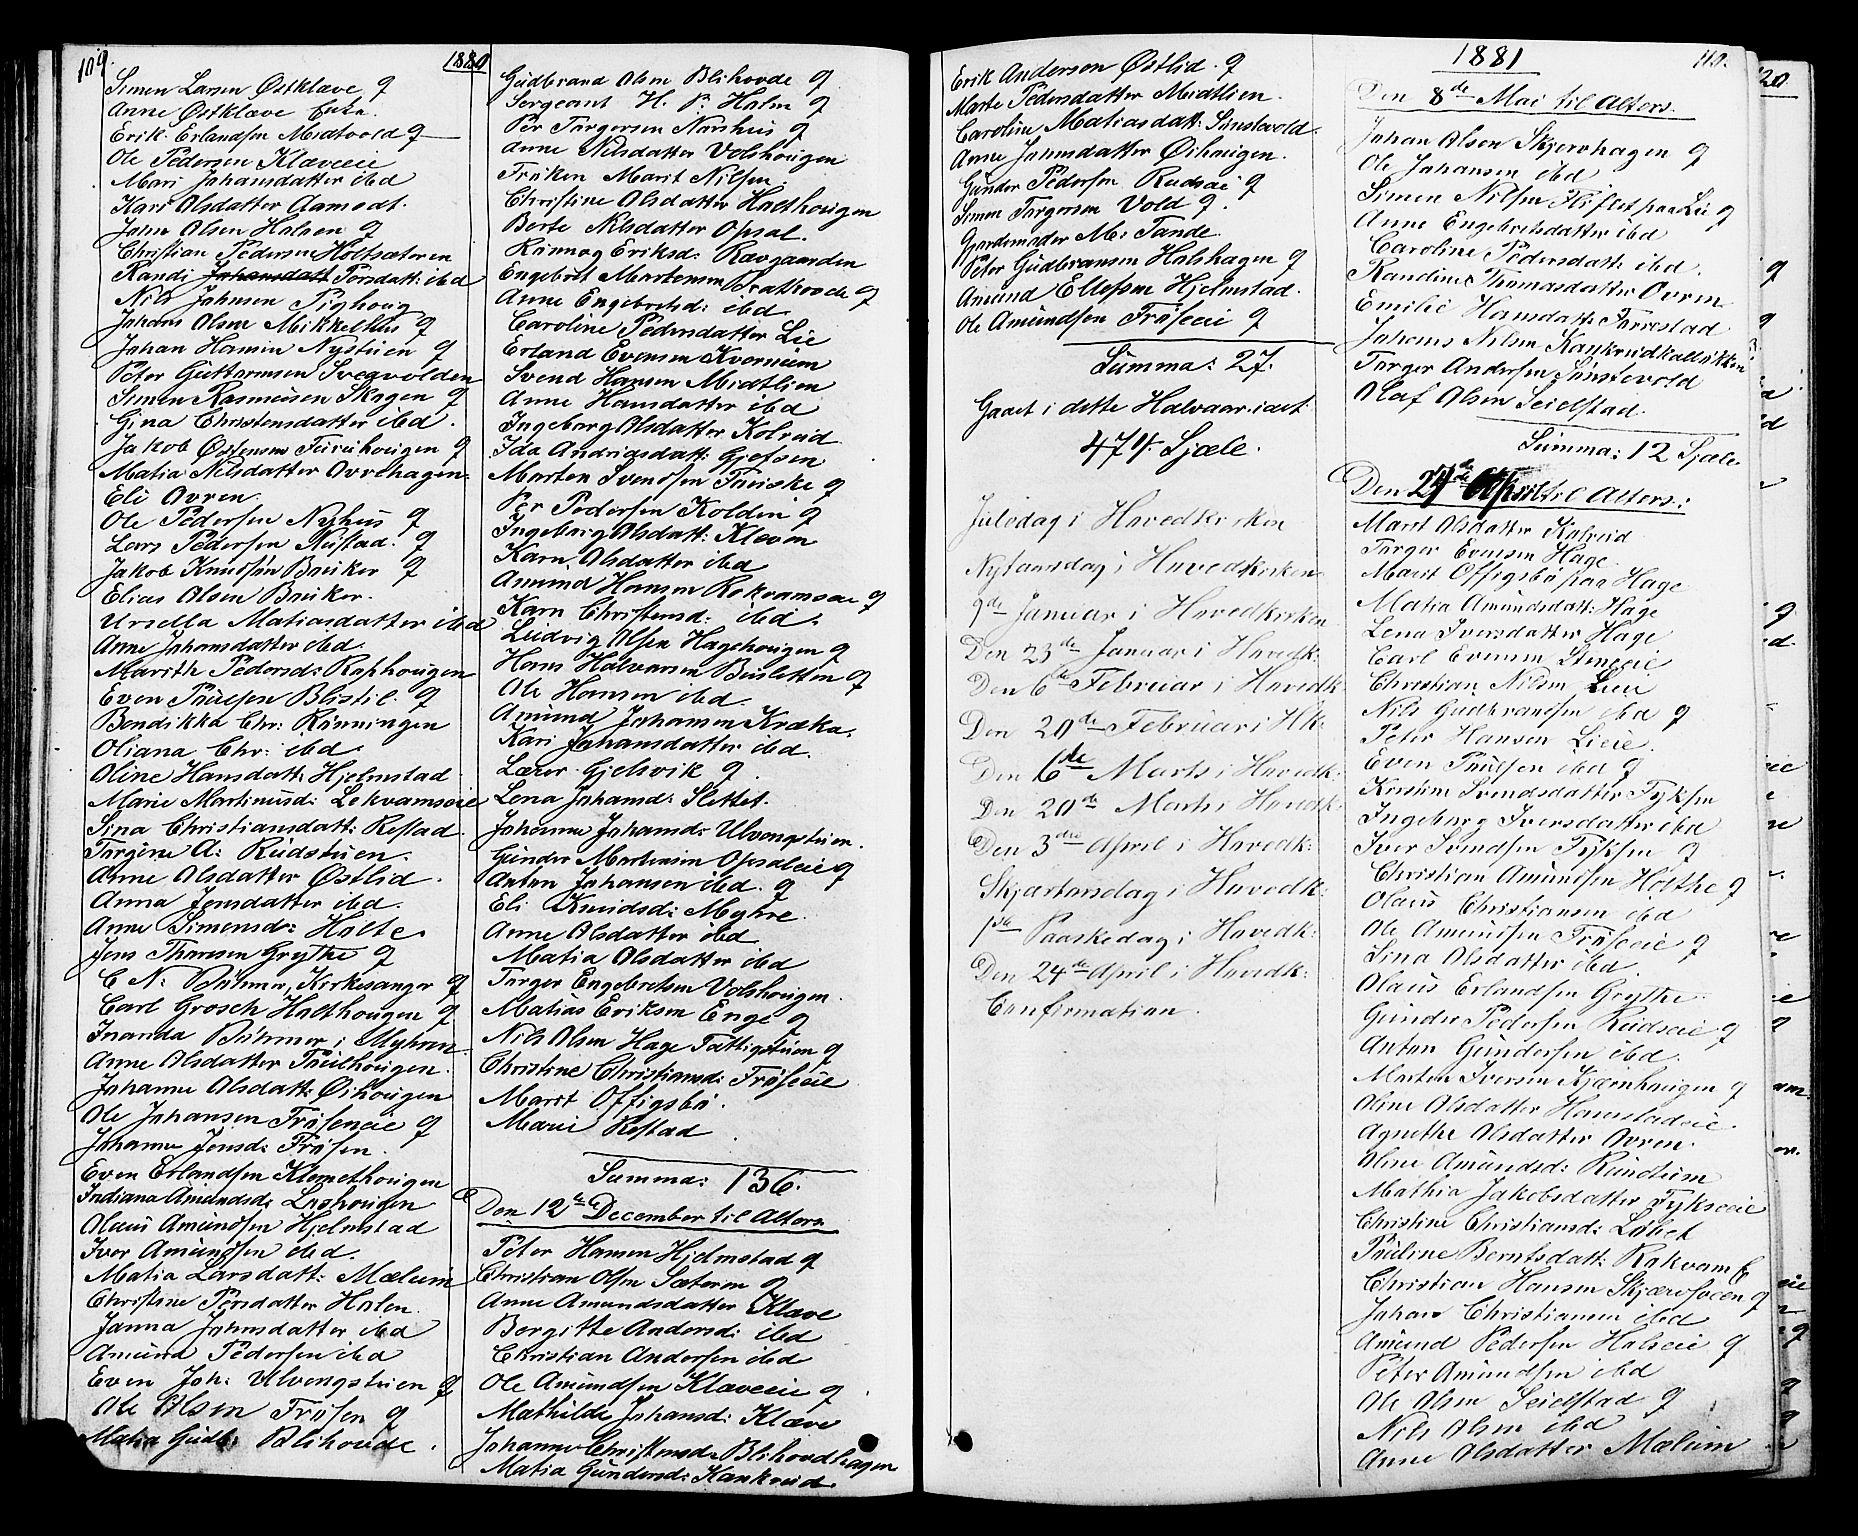 SAH, Østre Gausdal prestekontor, Klokkerbok nr. 1, 1863-1893, s. 109-110